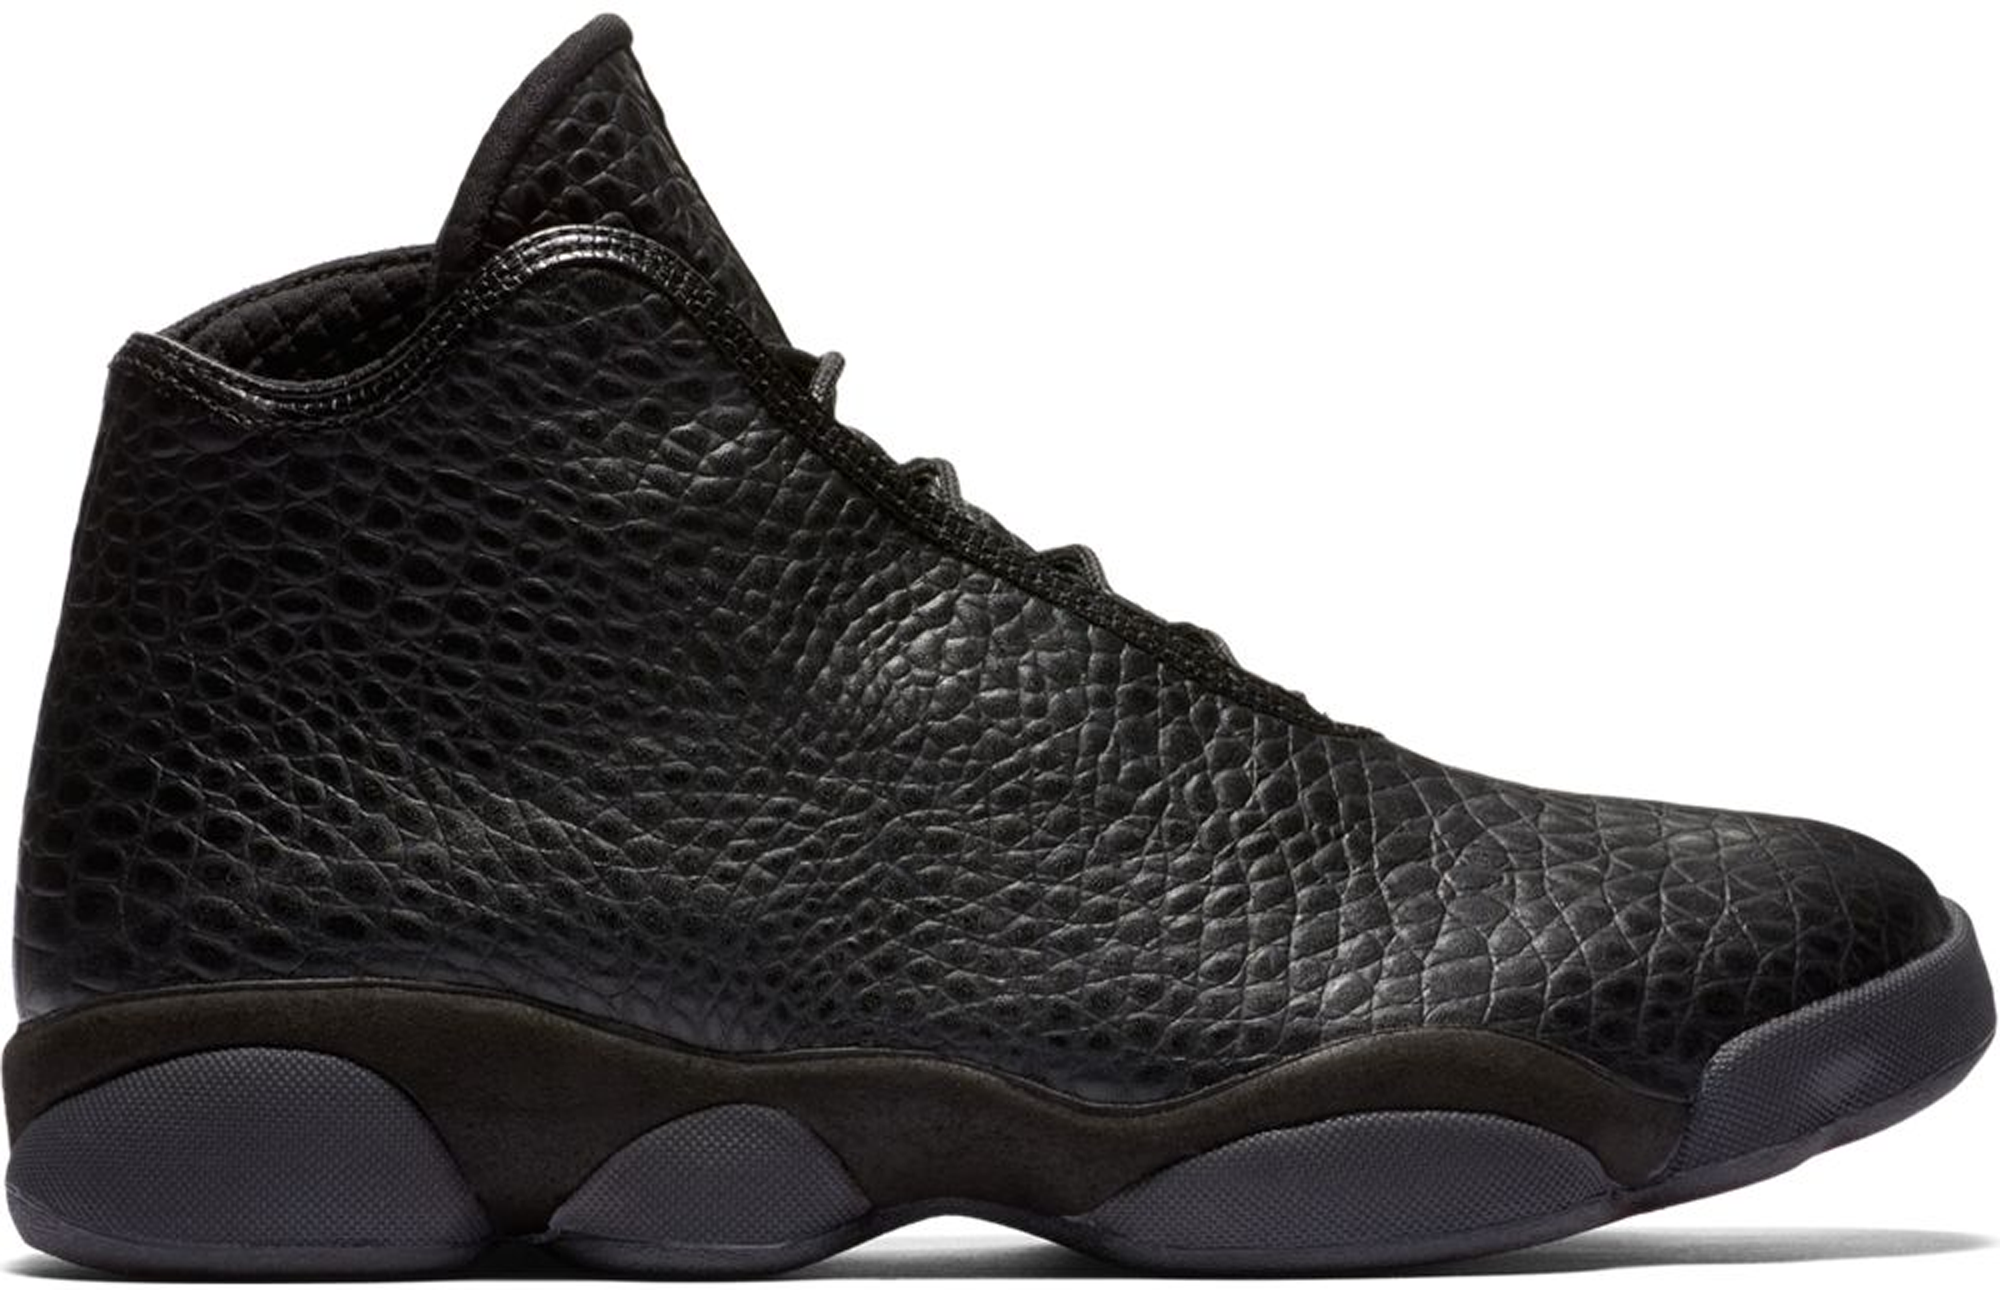 Jordan Horizon Black Croc - 822333-010